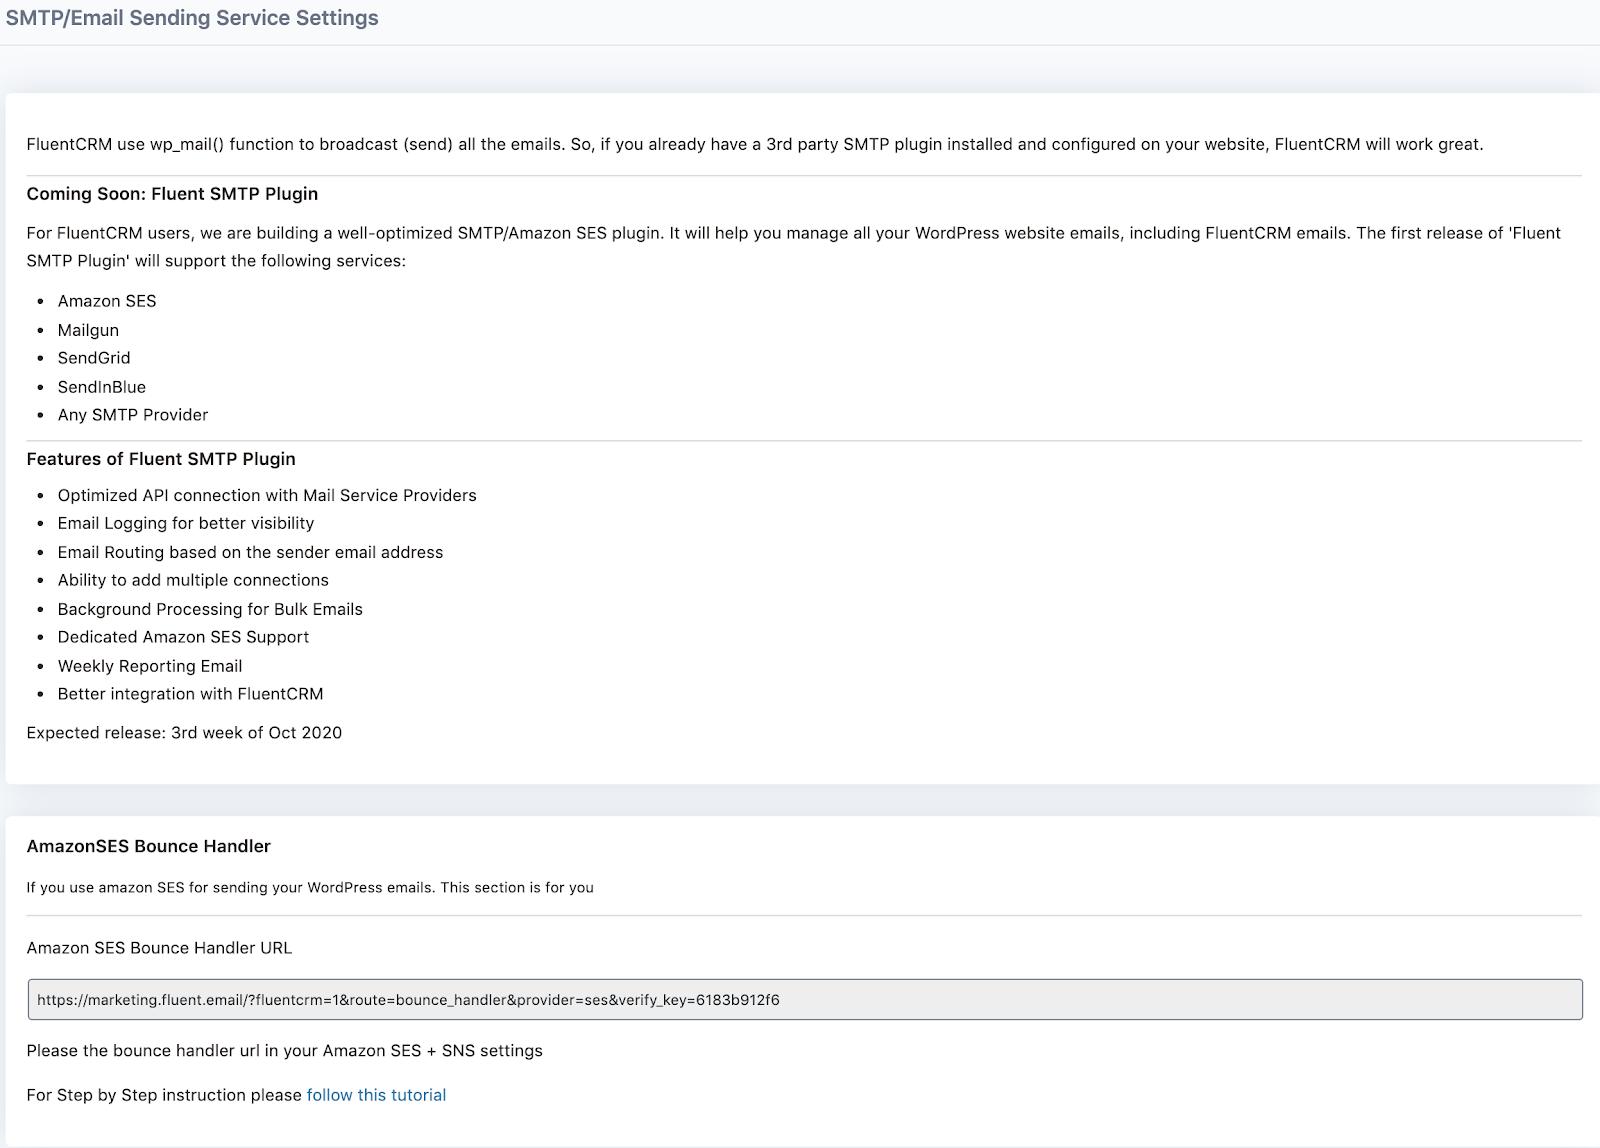 fluentcrm email settings